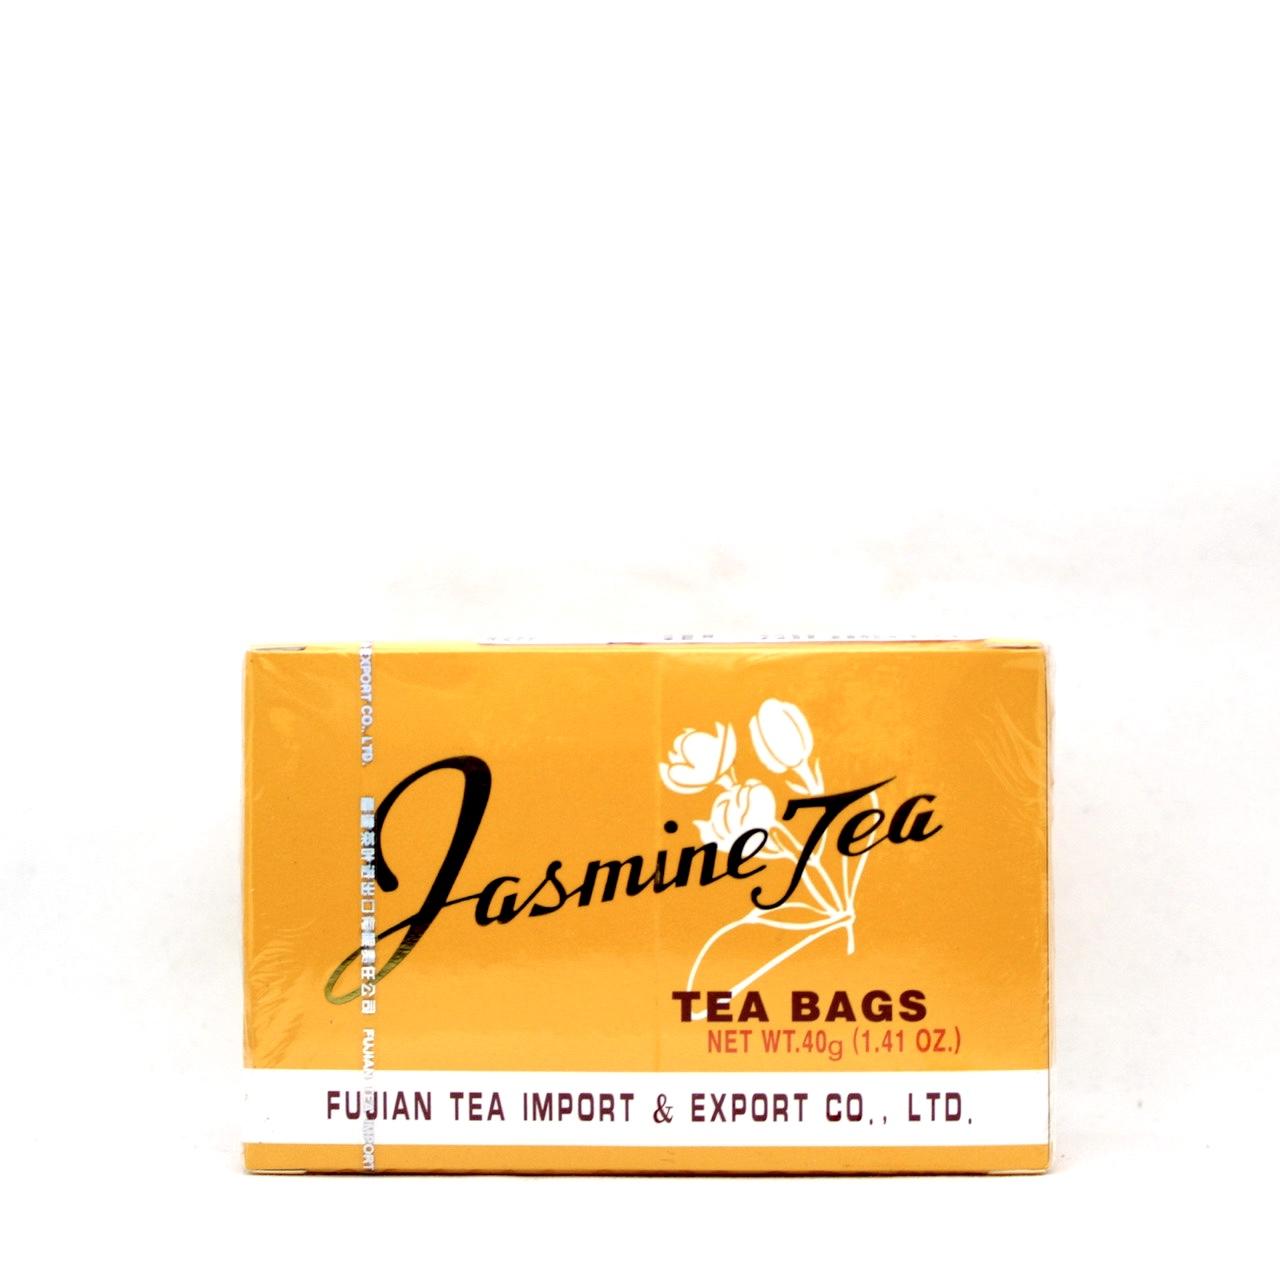 FUJIAN JASMINE TEA 2g X 20 SACHET JT 001 (VENCIMENTO 31/10/2021)